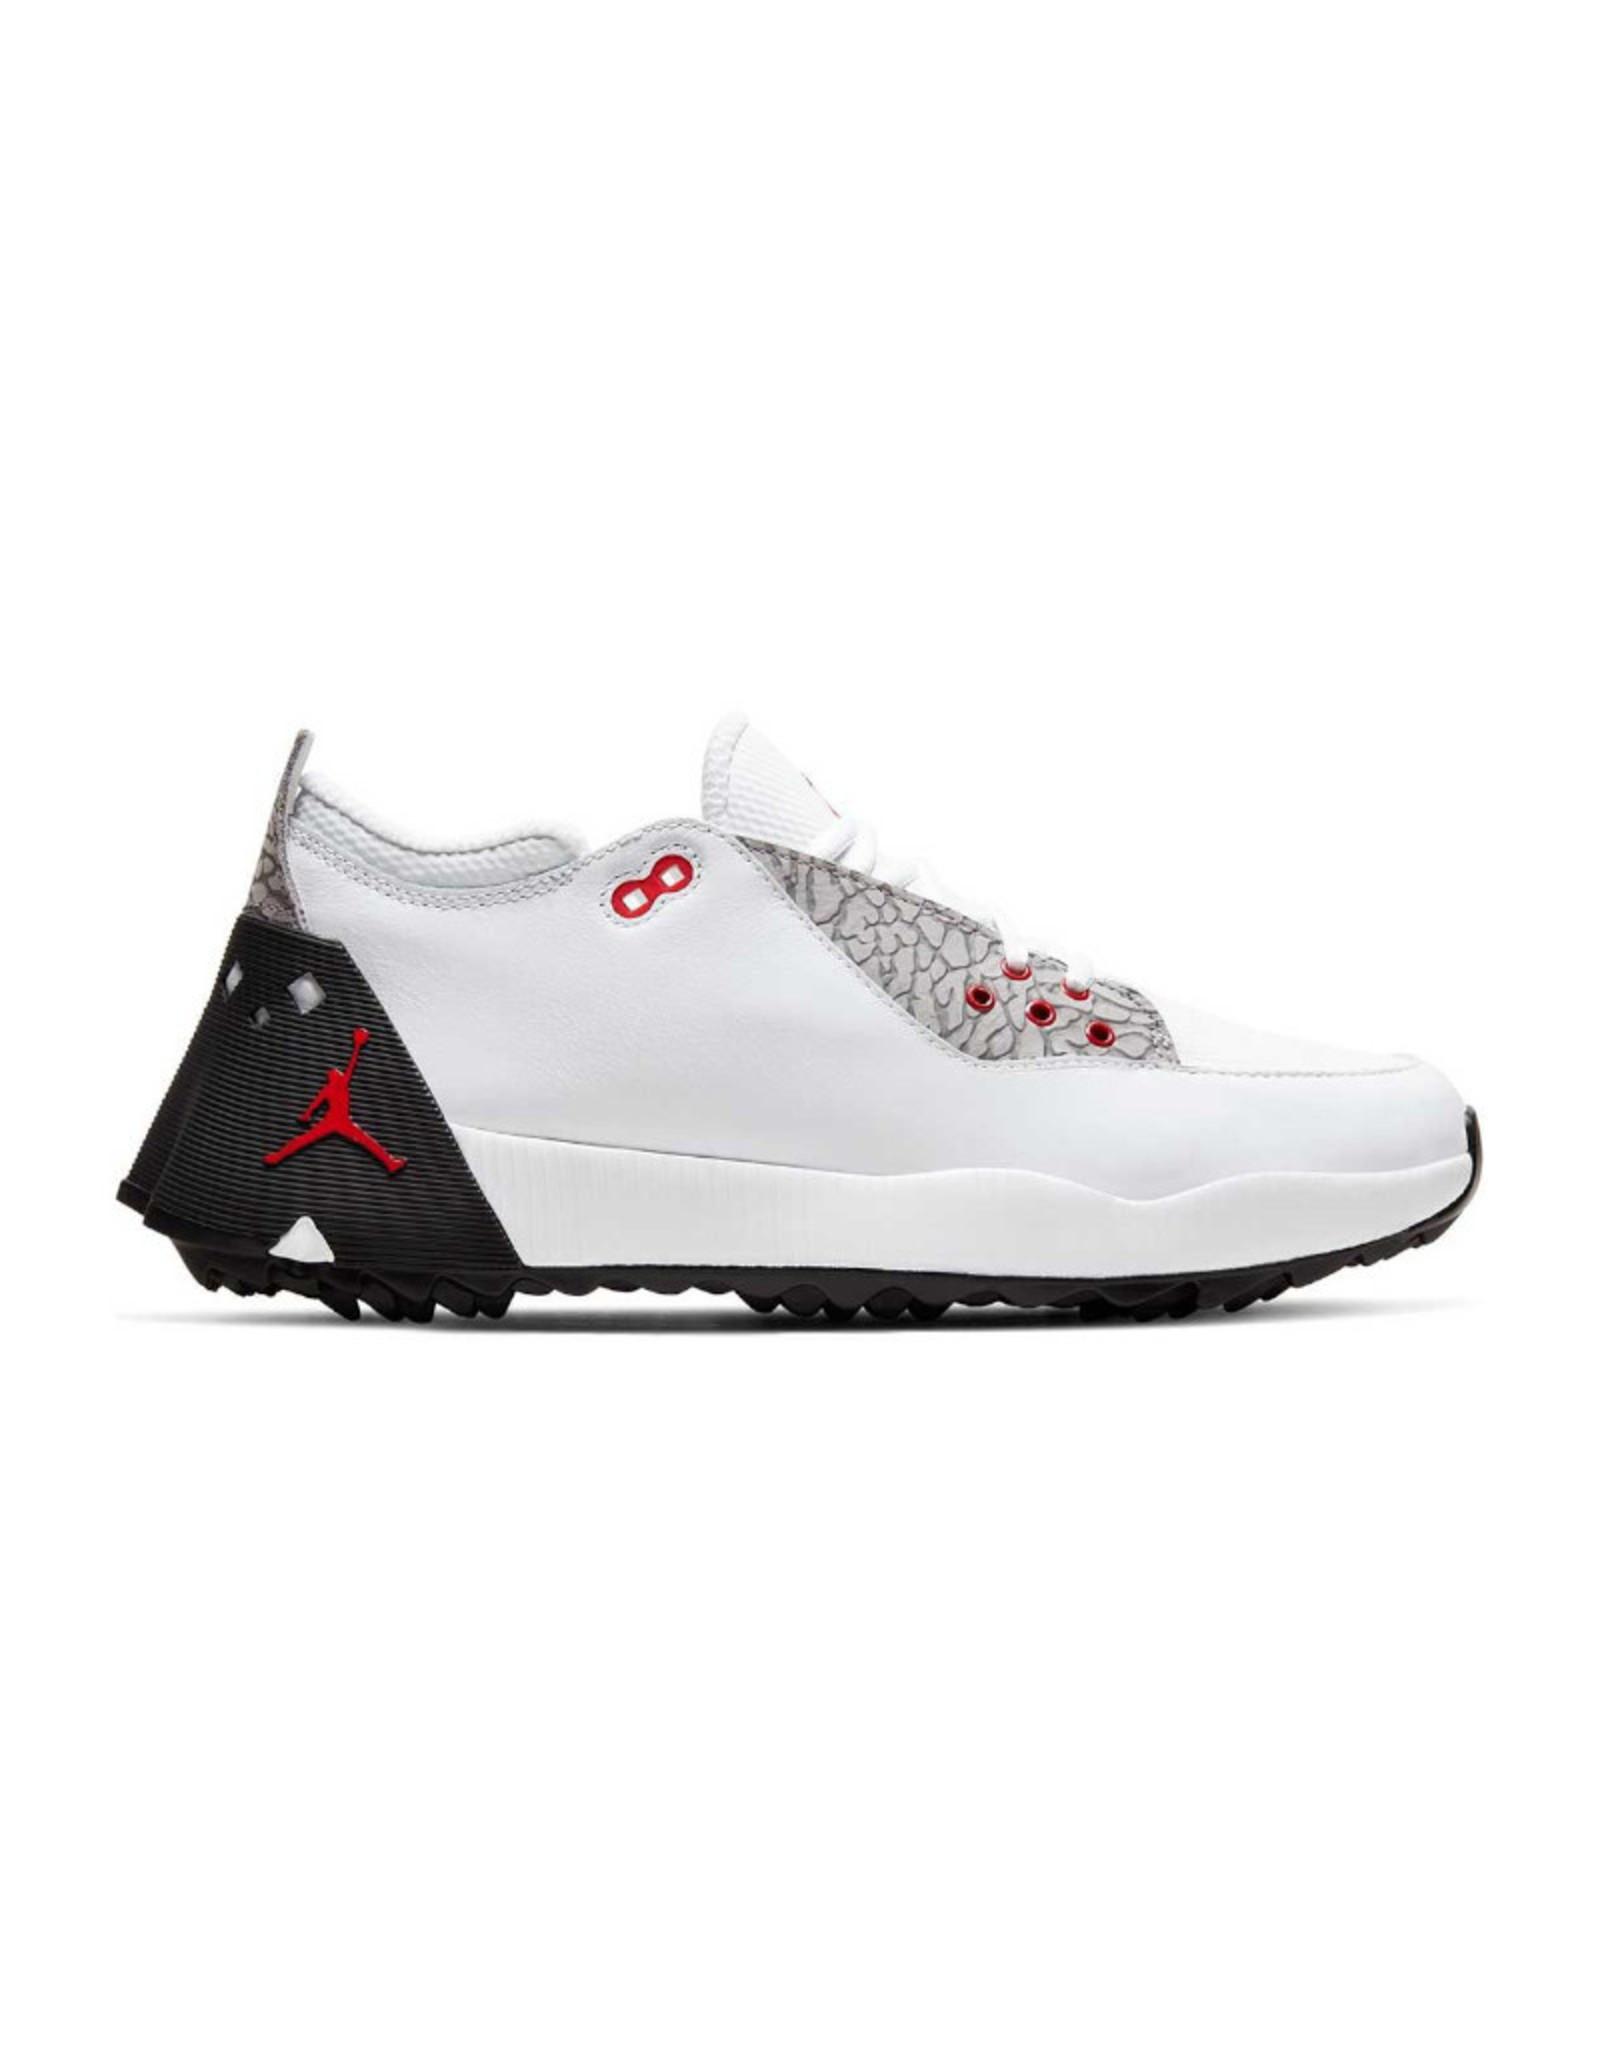 Nike Jordan ADG2 Shoe